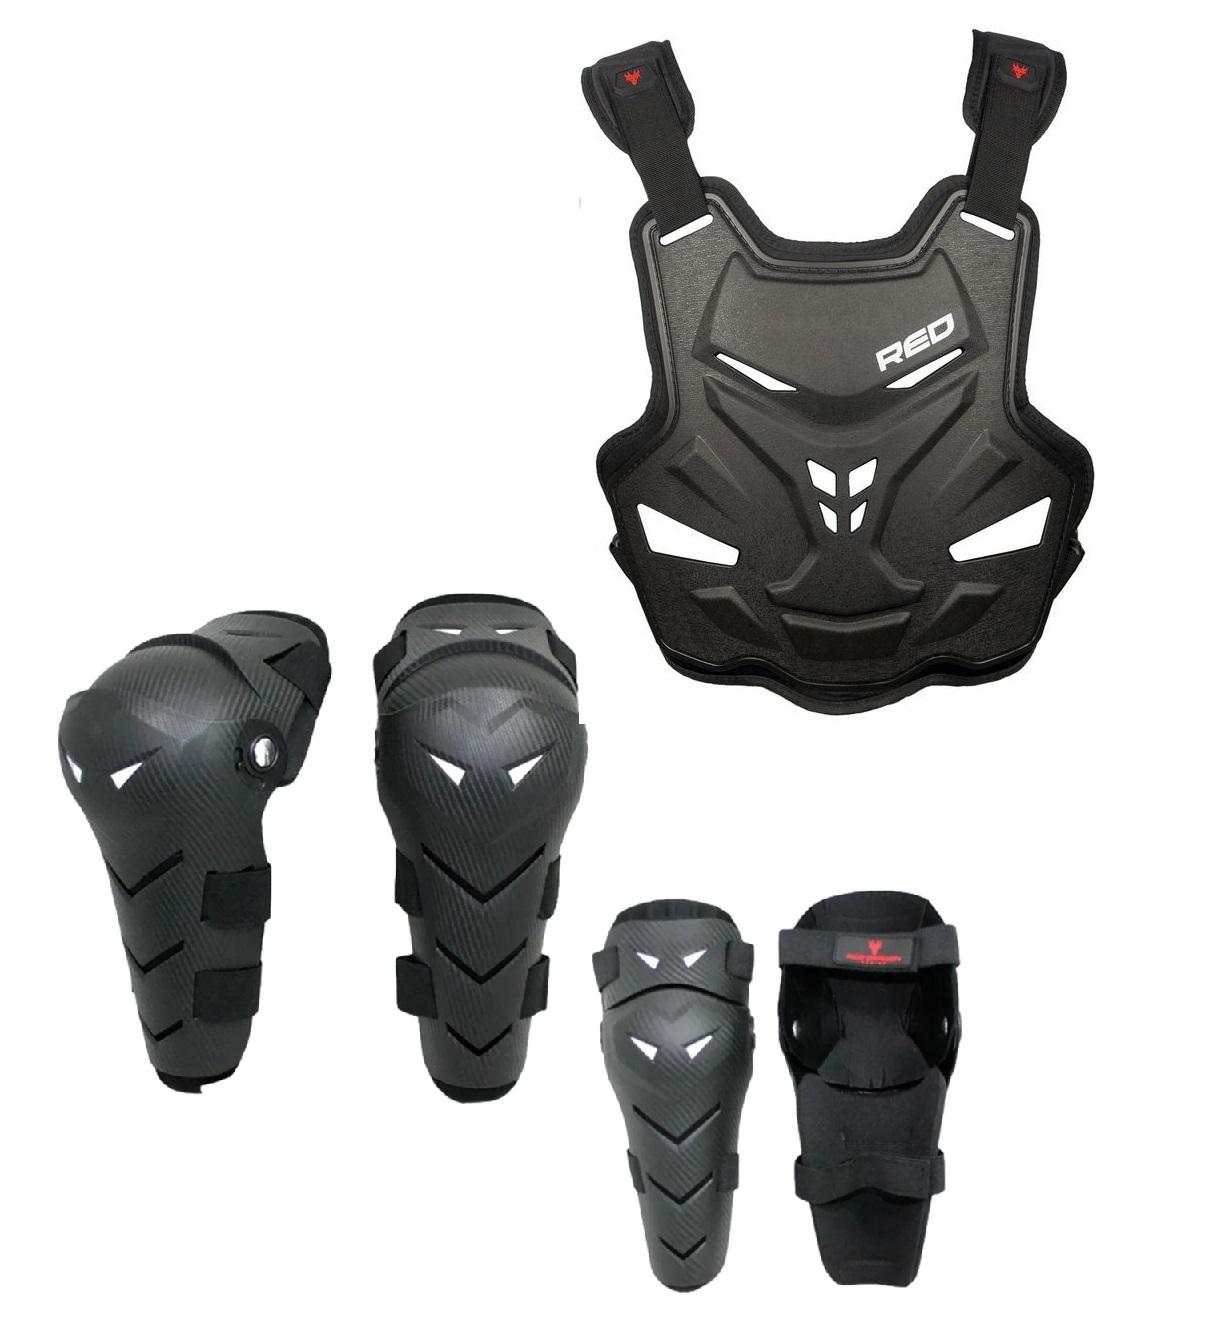 Kit Proteção Motocross Red Dragon Attack